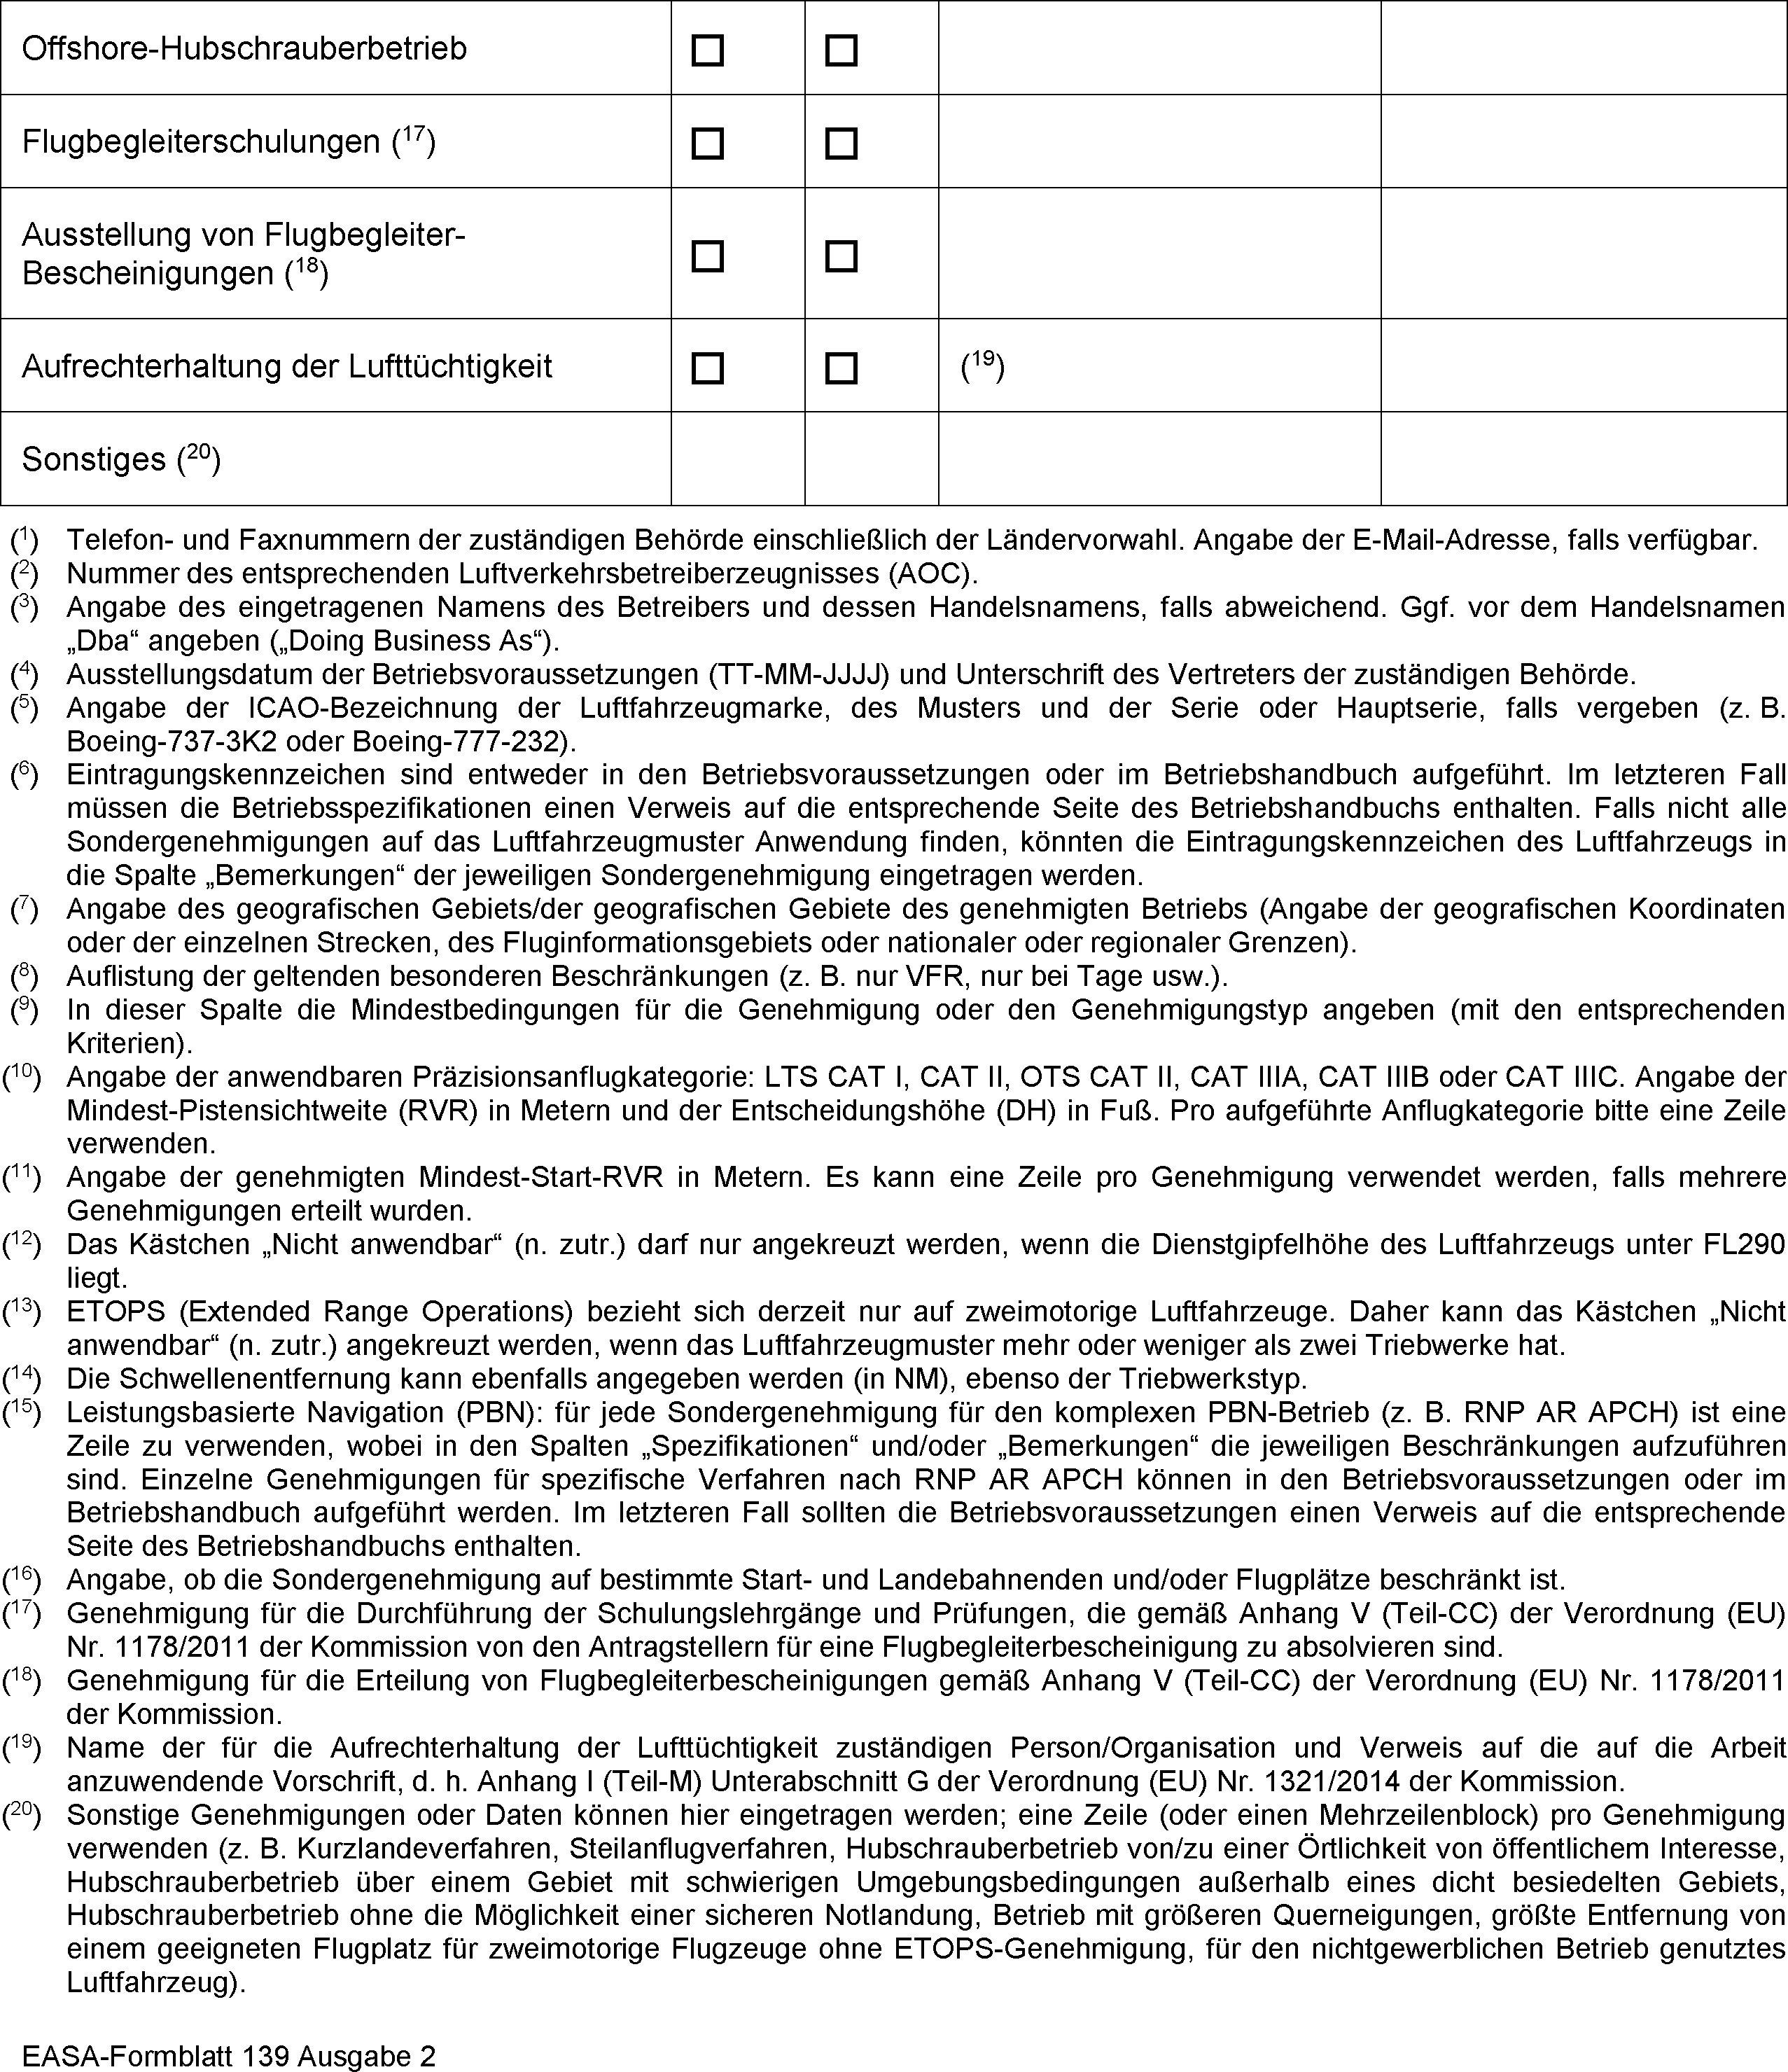 EUR-Lex - 02012R0965-20160825 - EN - EUR-Lex